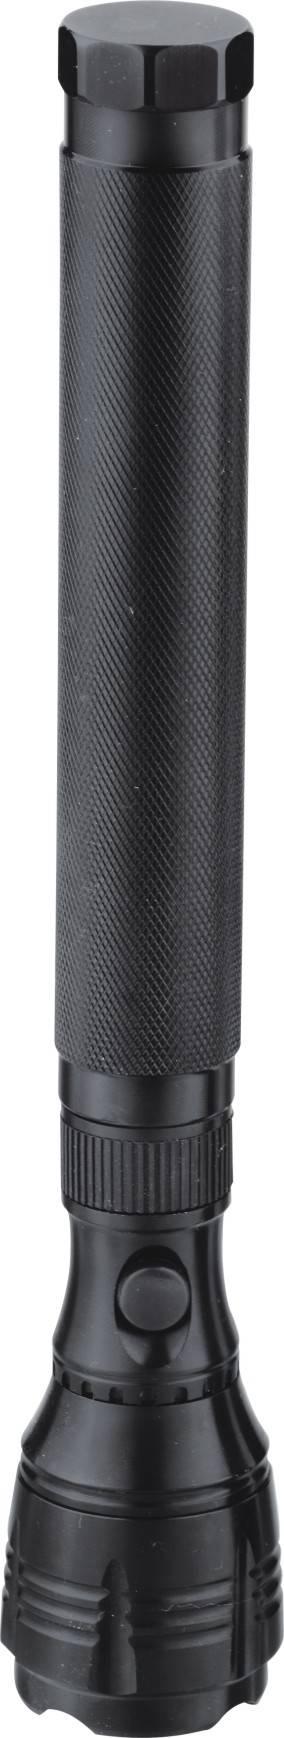 3xC rechargeable Ni-Cd batteries High Power Long Waterproof 3W LED flashlight